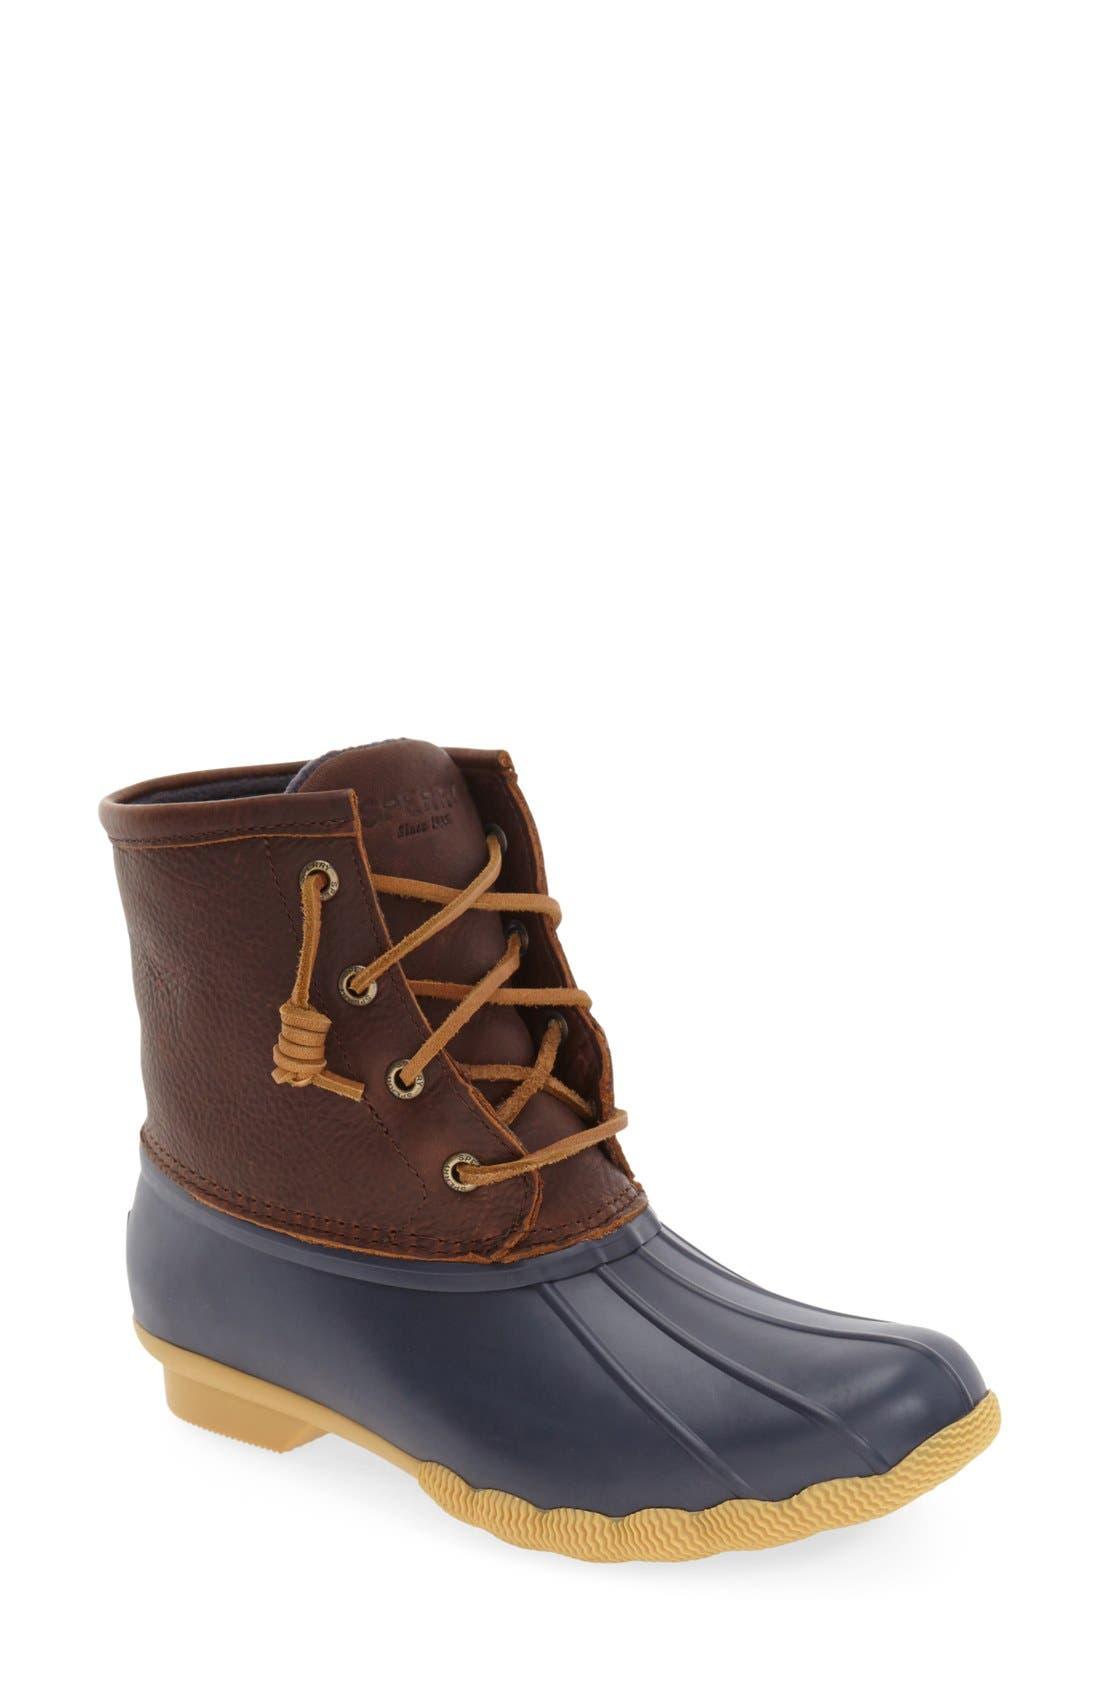 Main Image - Sperry 'Saltwater' Waterproof Rain Boot (Women)